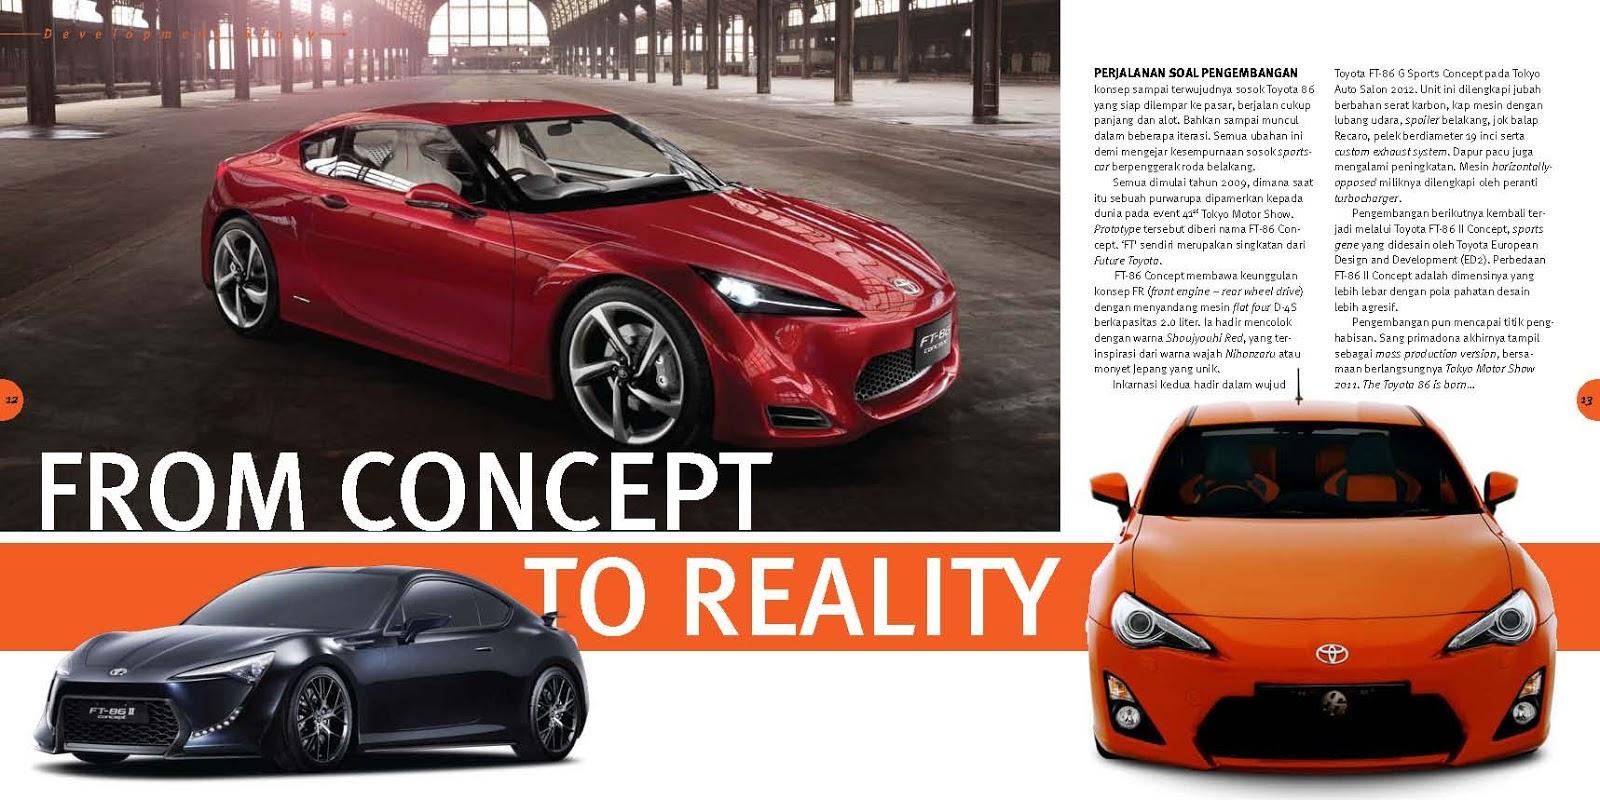 New Innova Venturer 2018 Price Toyota Yaris Trd Sportivo | Harga Mobil Di Jakarta